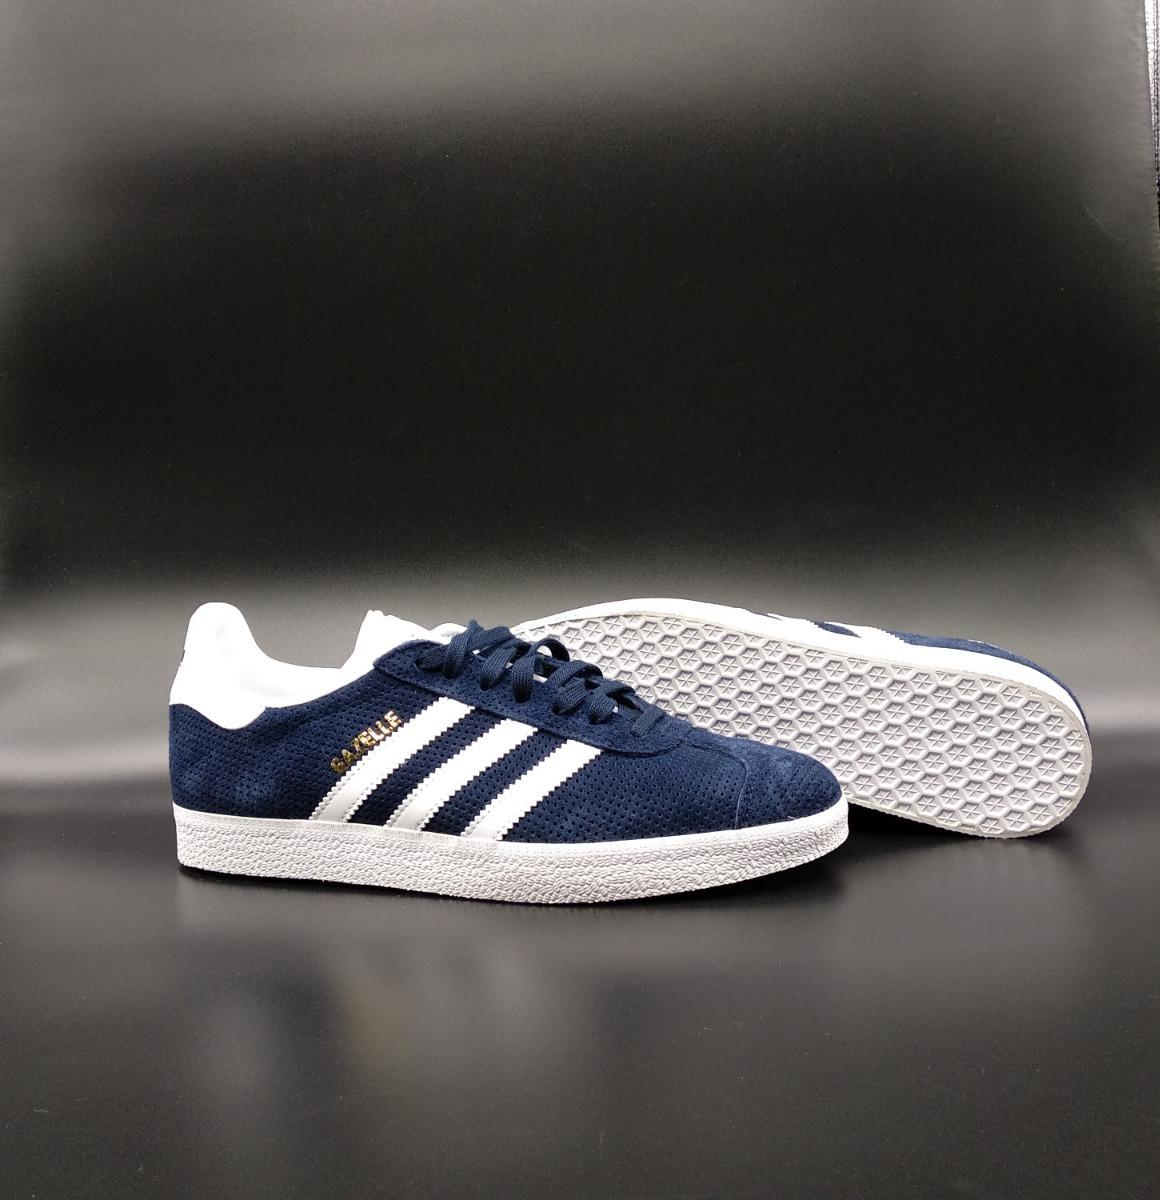 tenis adidas gazelle w azul escuro ou bege originals. Carregando zoom. bc7f078c9f1c5